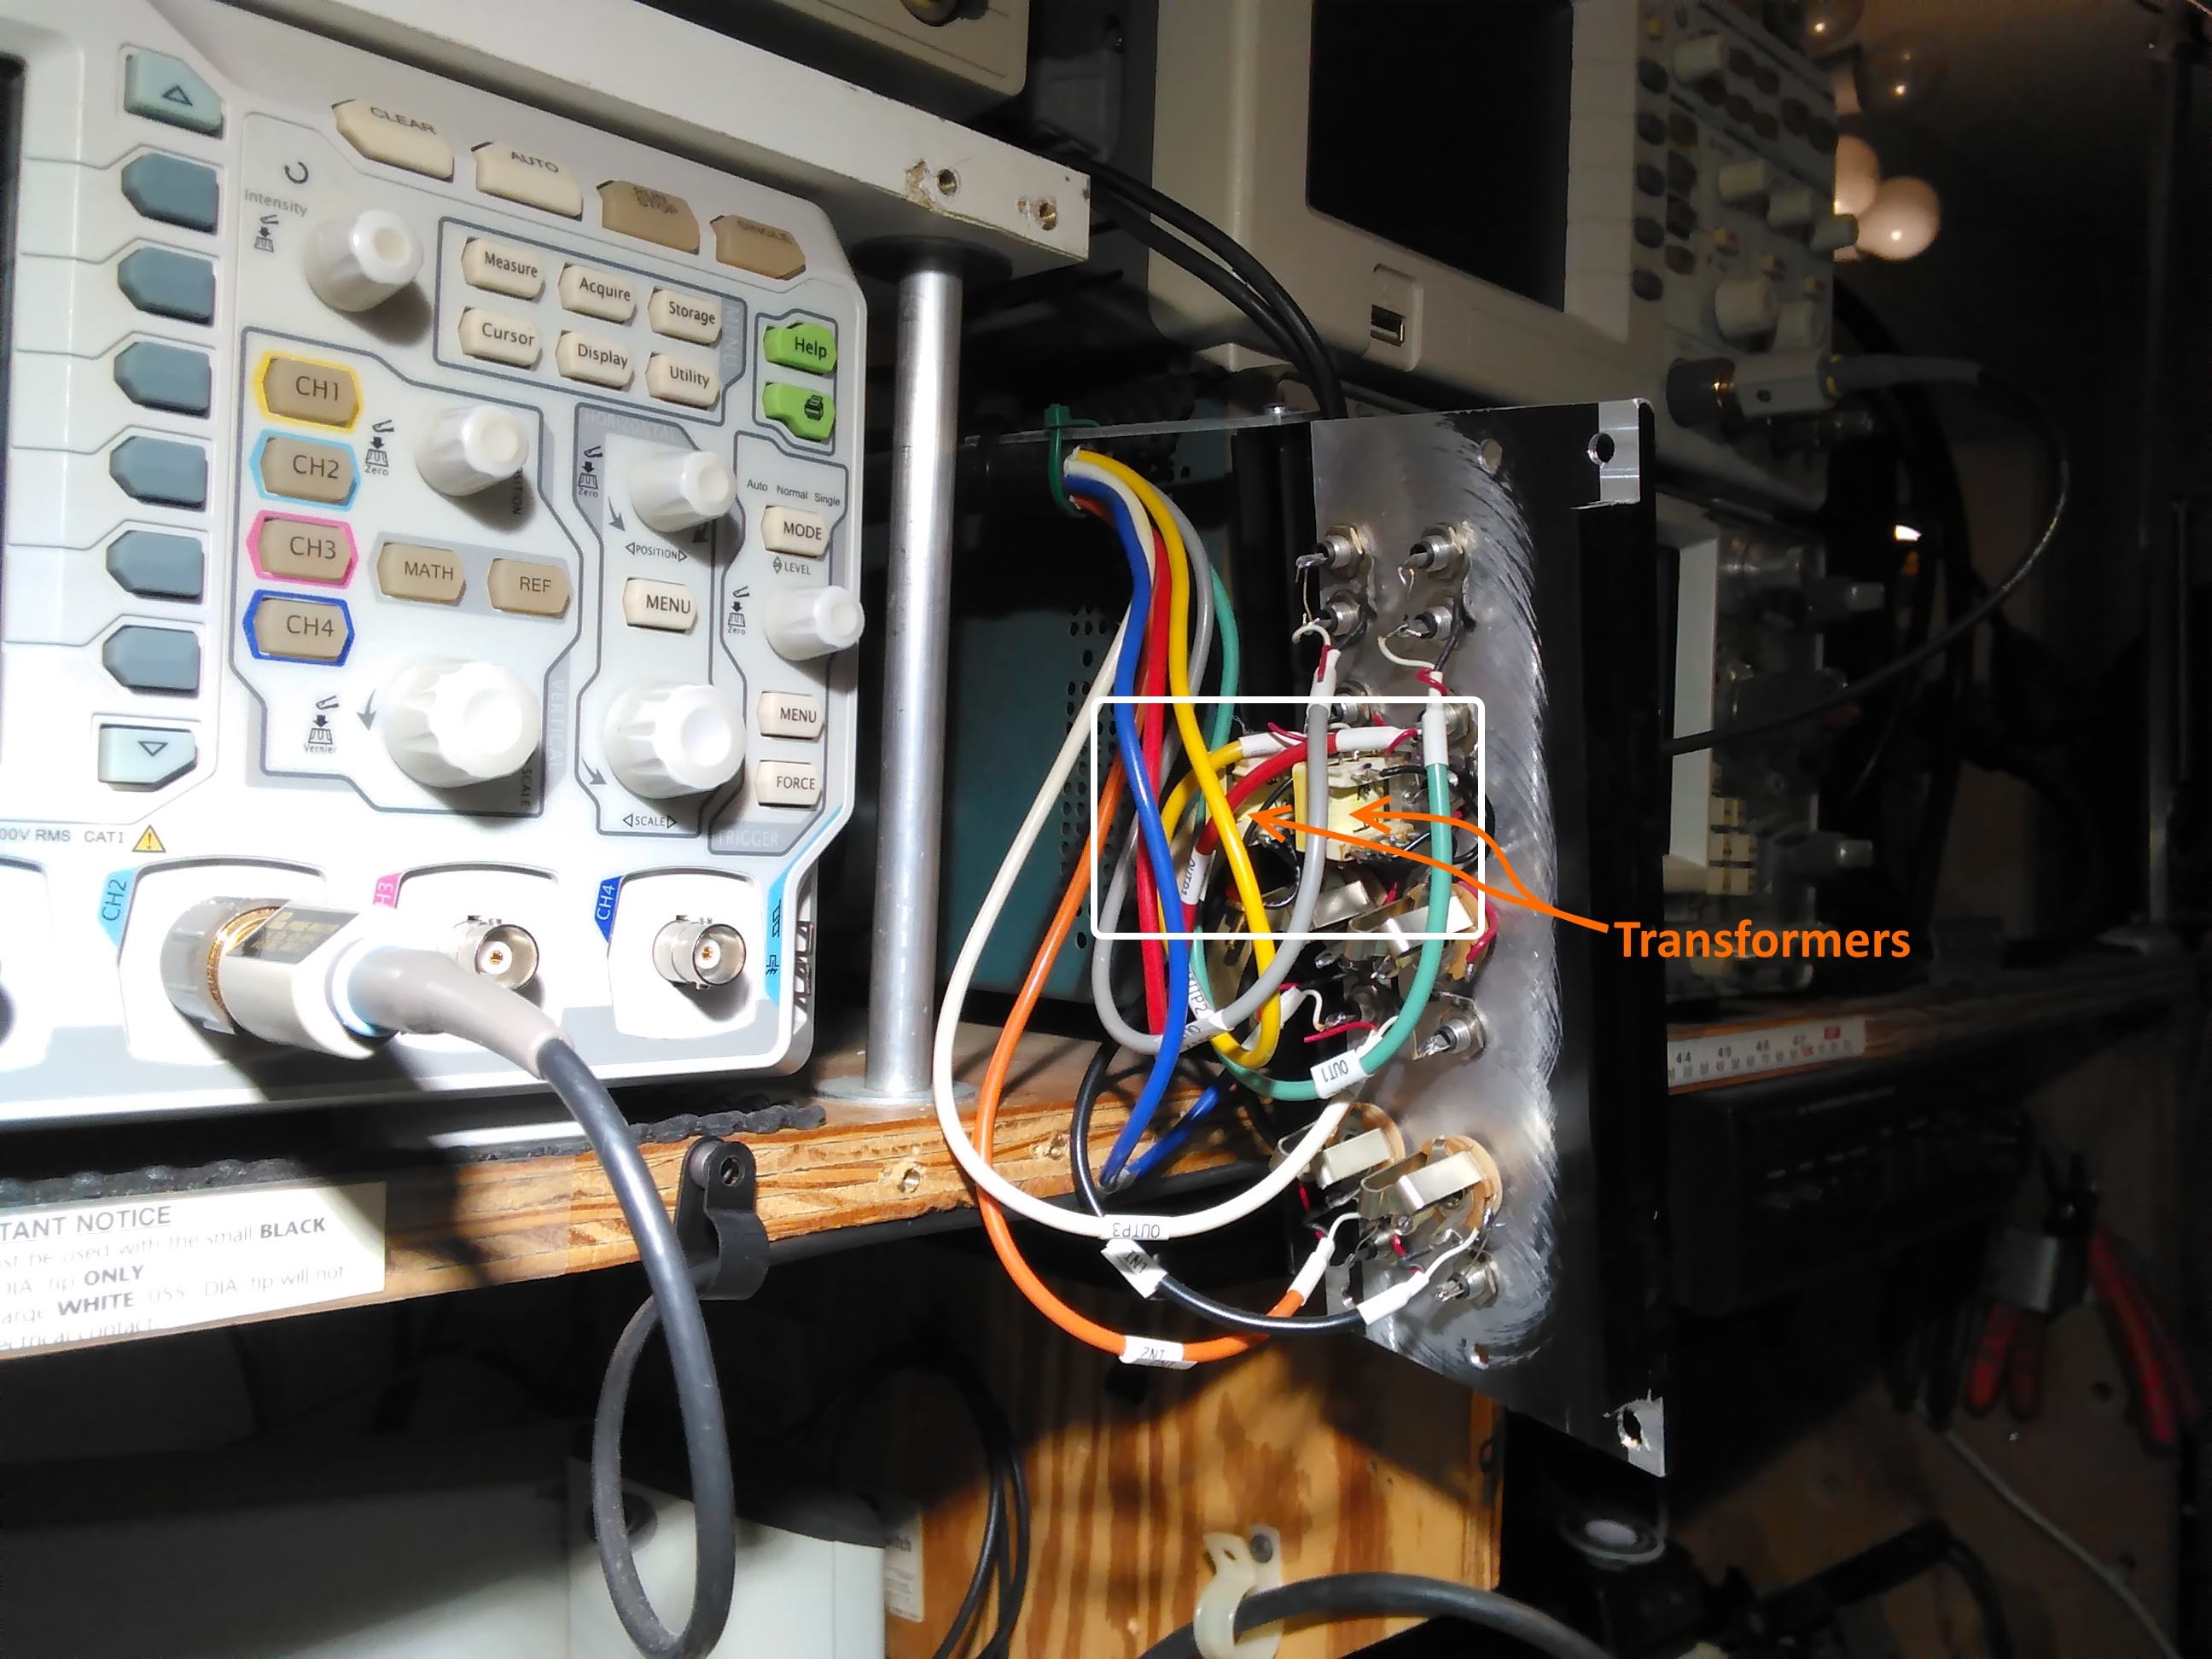 UHD-transformers.jpg